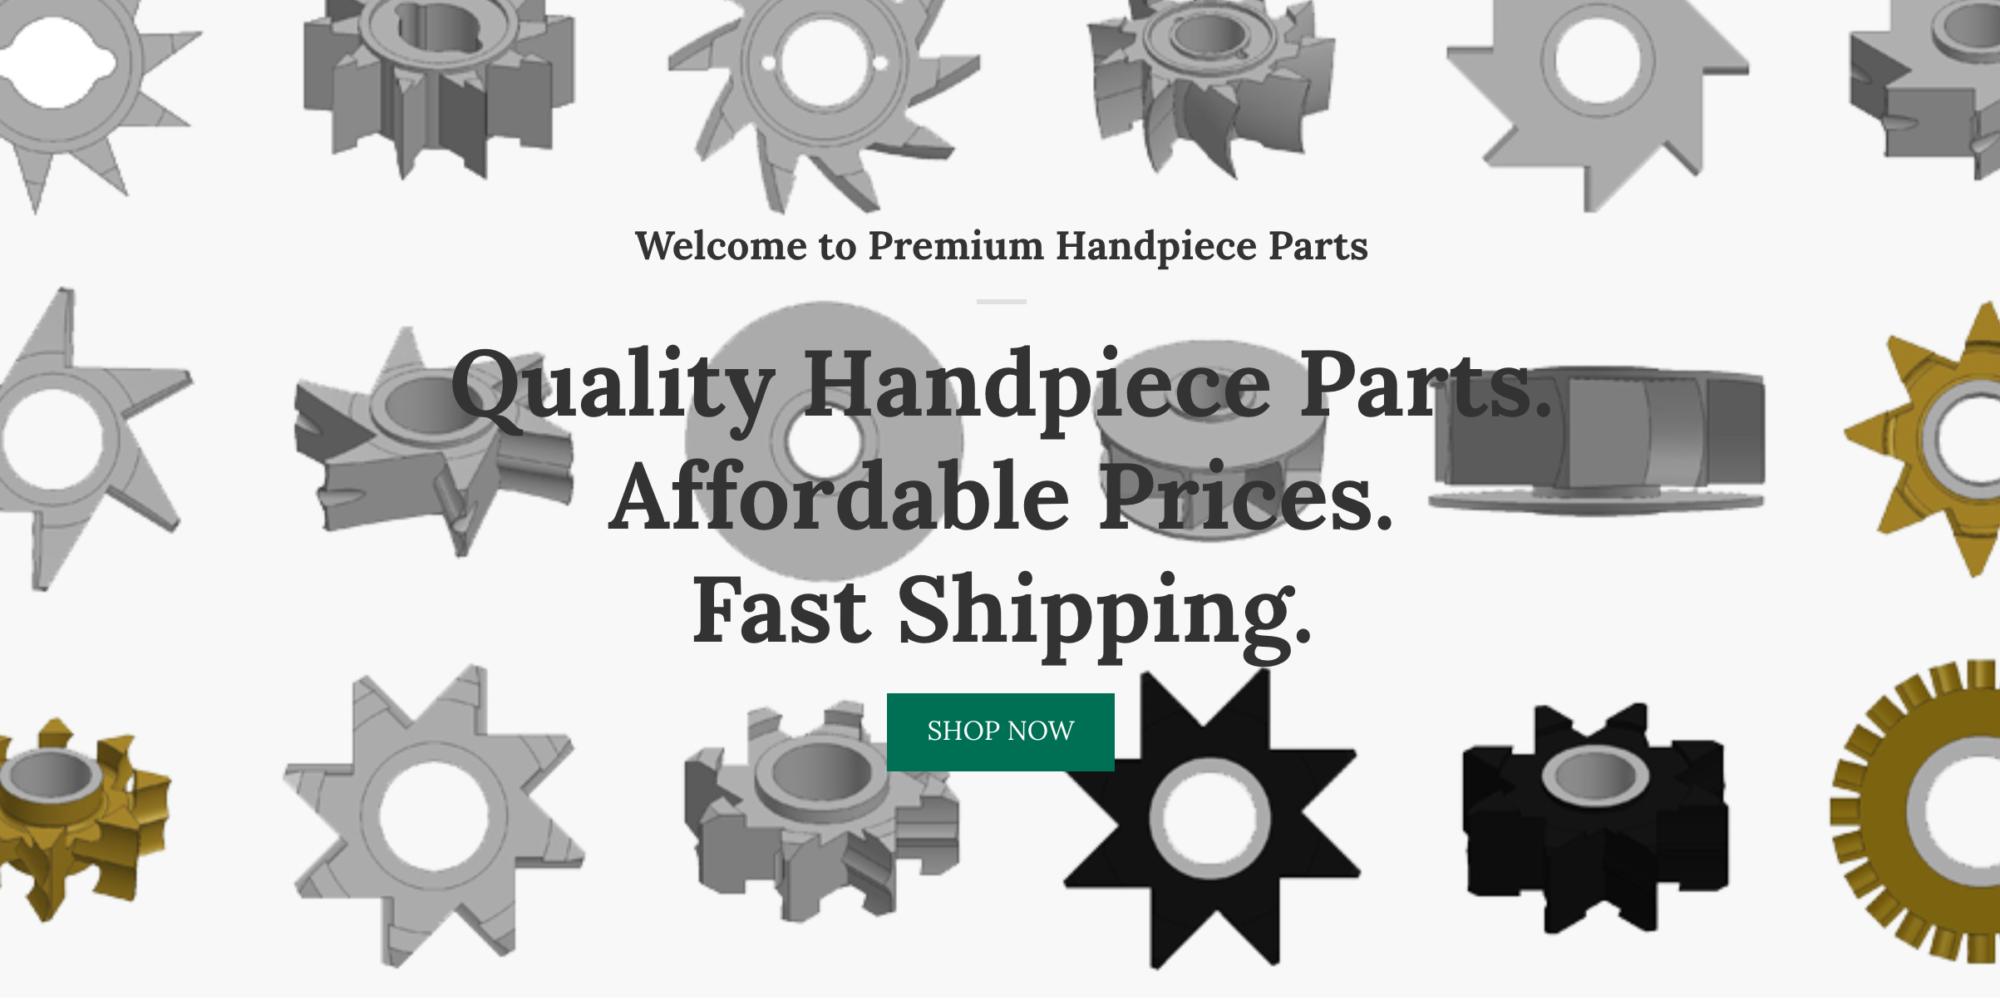 Premium Handpiece Parts Home Page Slider to shop for dental handpiece parts for dental handpiece repair